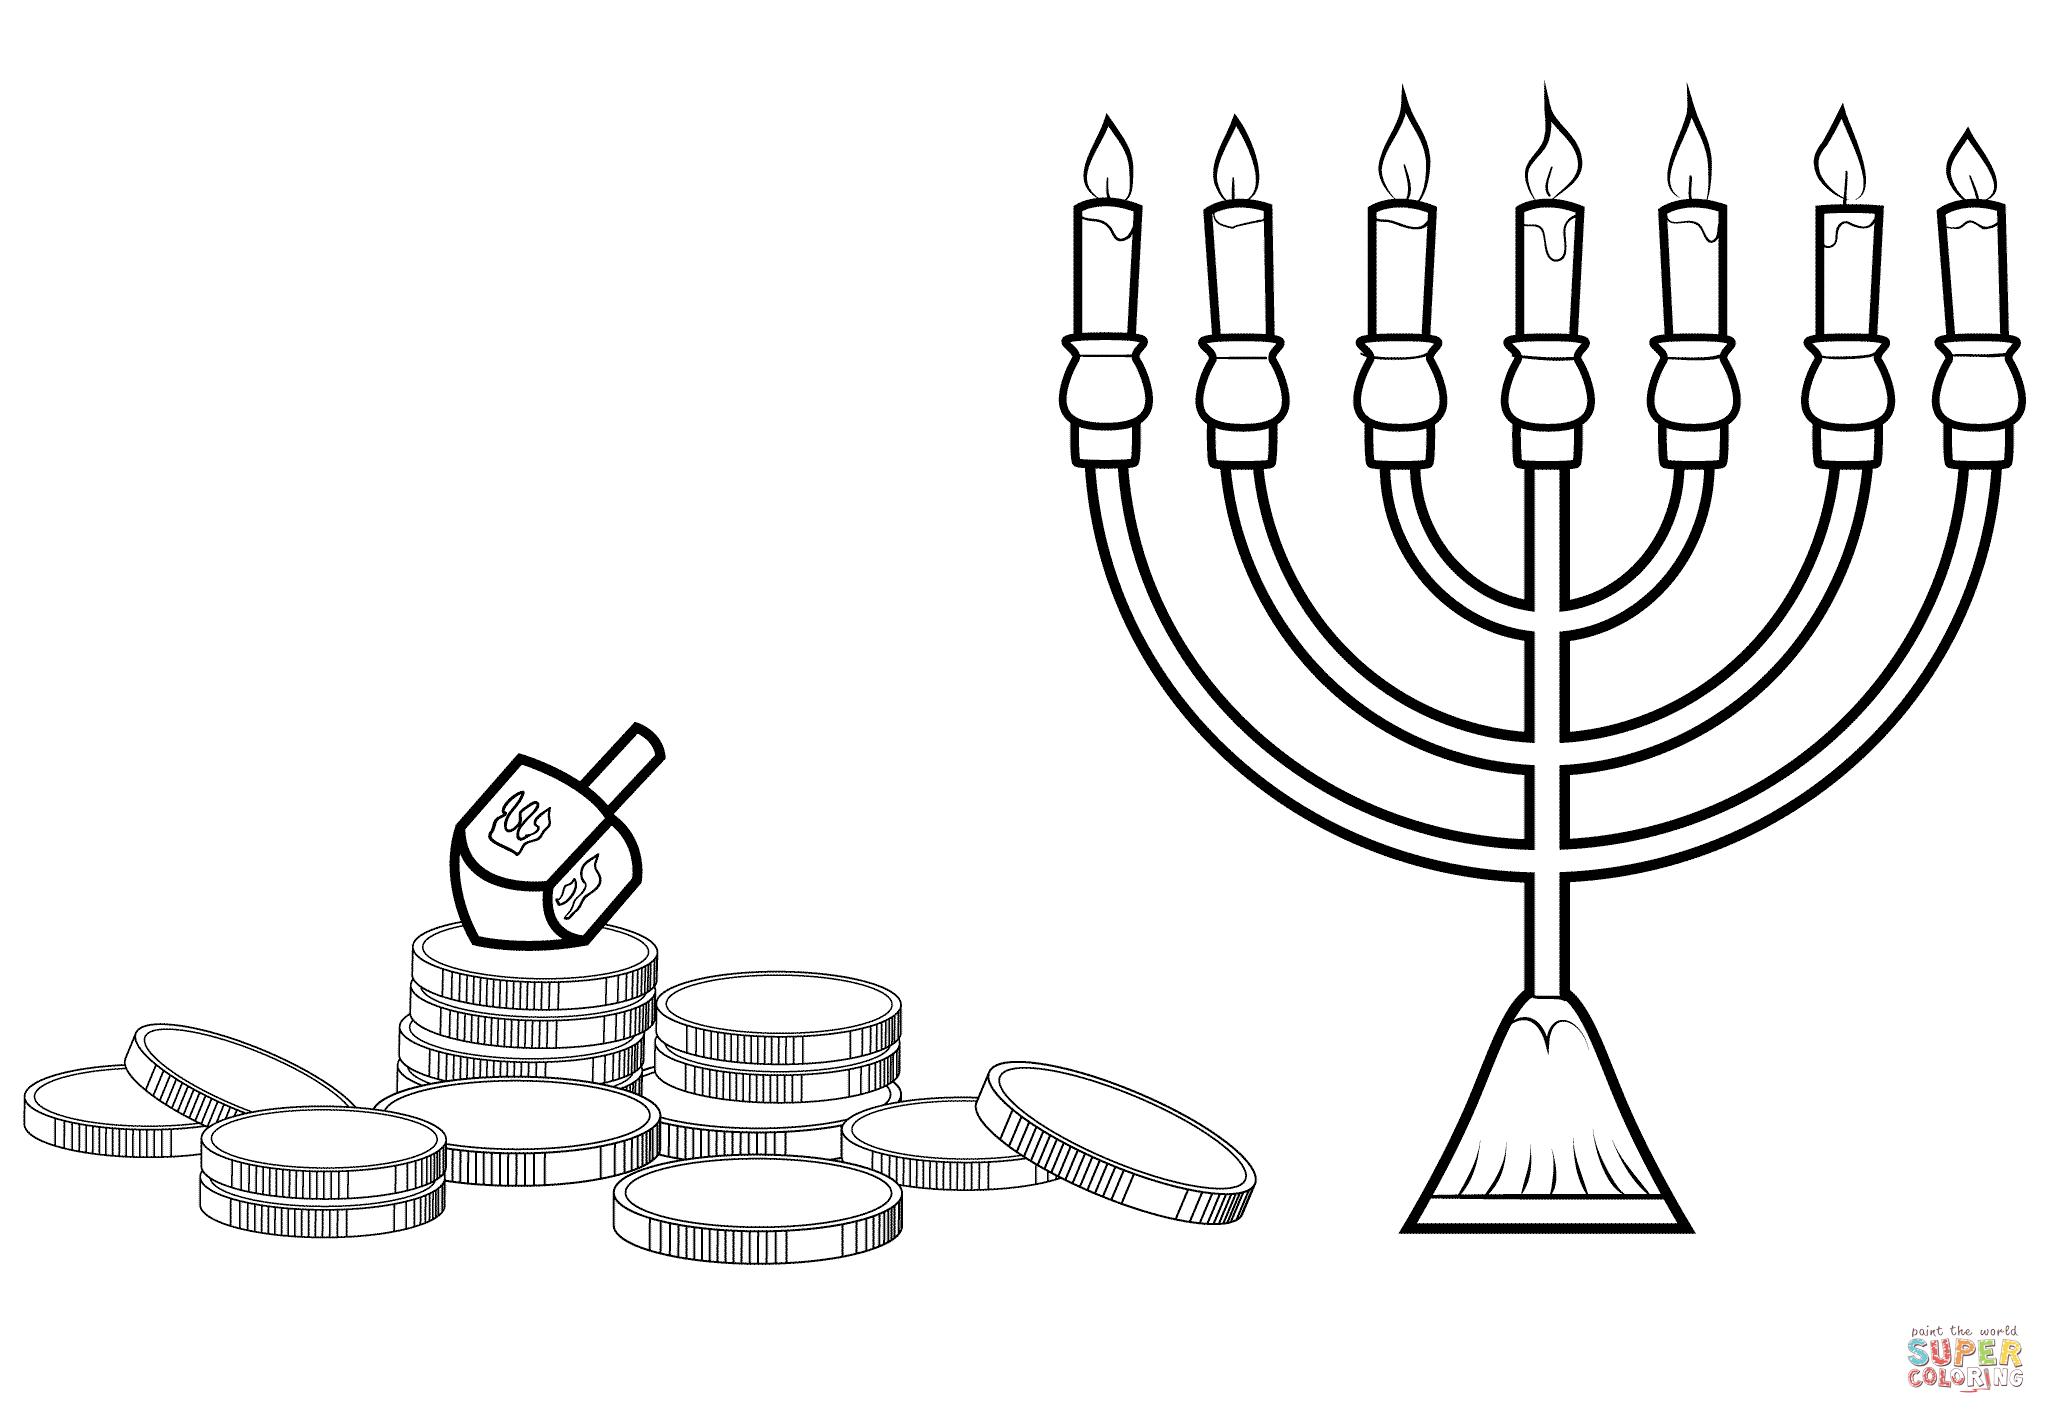 Top Image Hanukkah Coloring Pages Printable In 2020 Coloring Pages Inspirational Coloring Pages Free Printable Coloring Pages